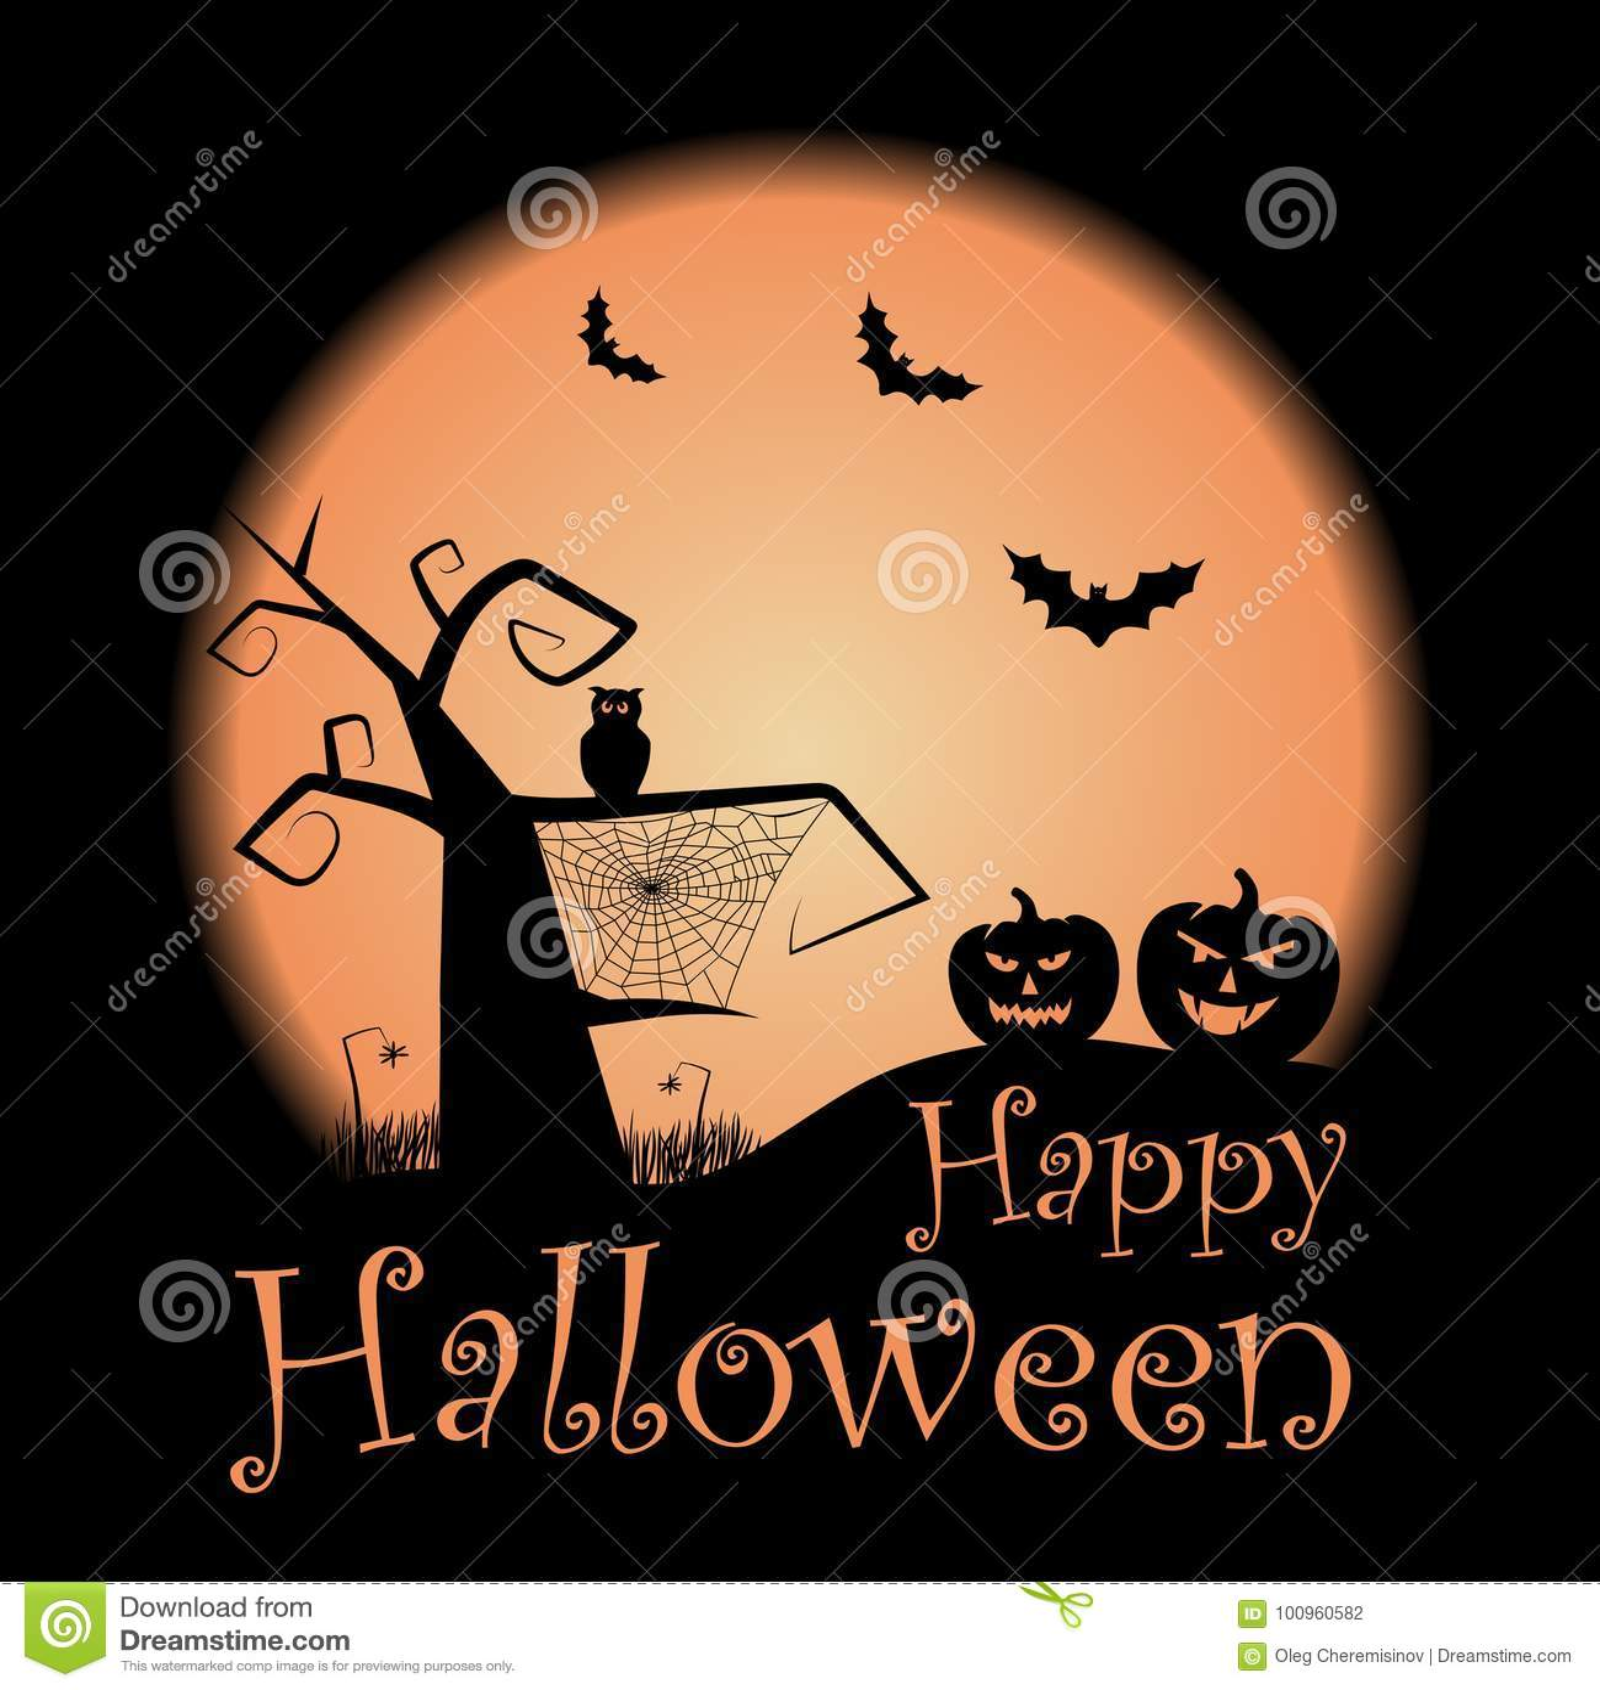 Happy Halloween Illustration. Vector Halloween Design Template With ...